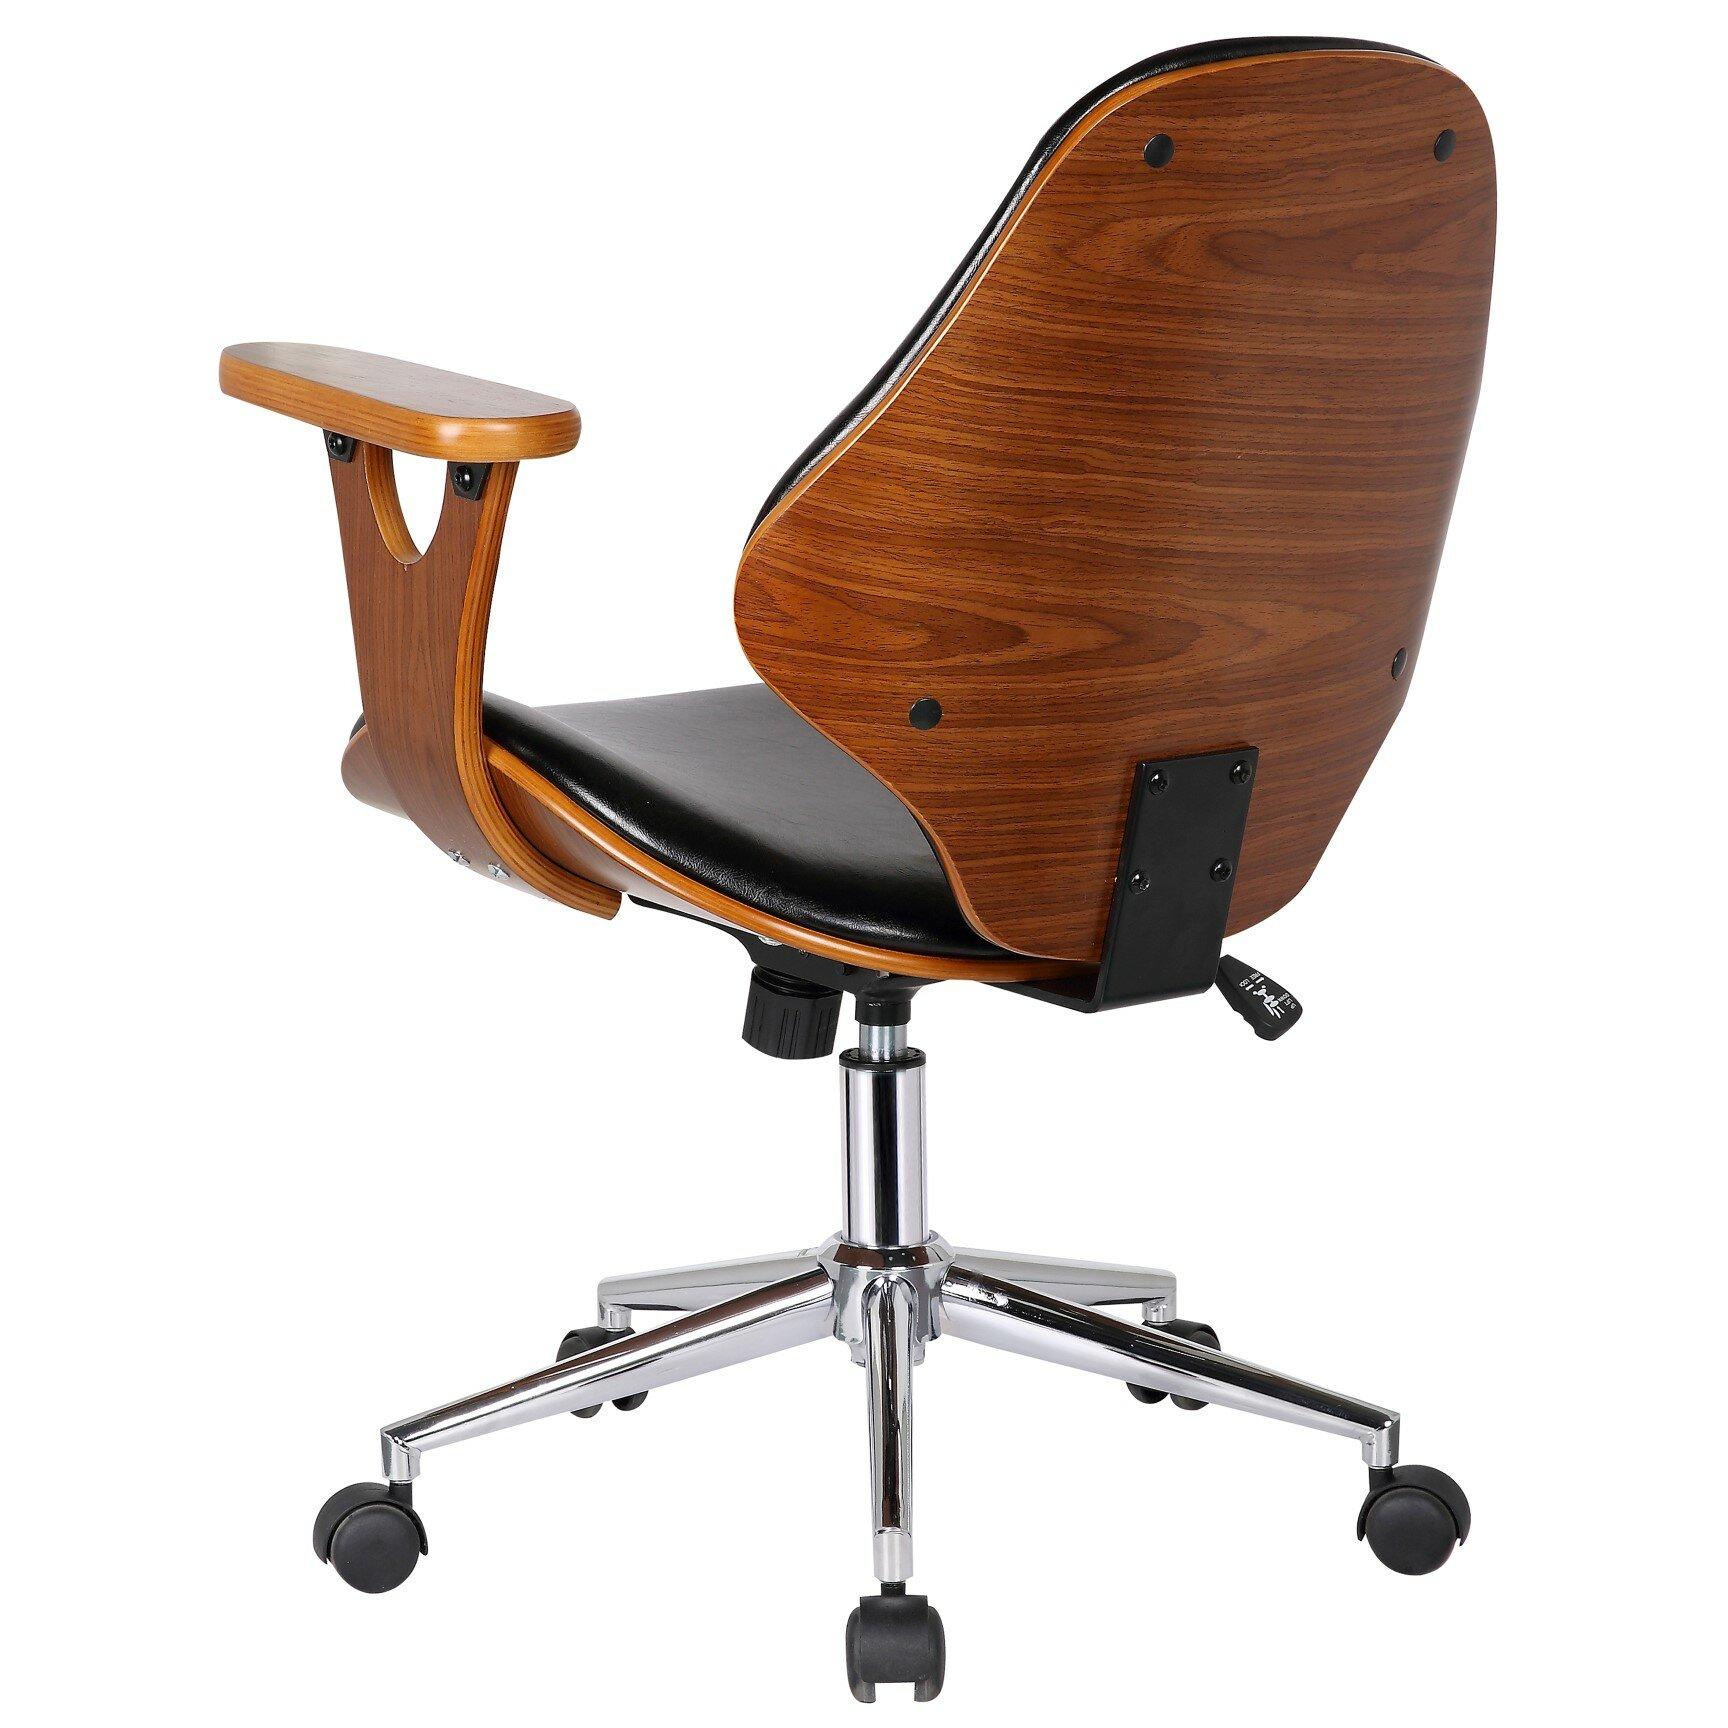 Adjustable Desk Chair contemporary desk chair w adjustable seat